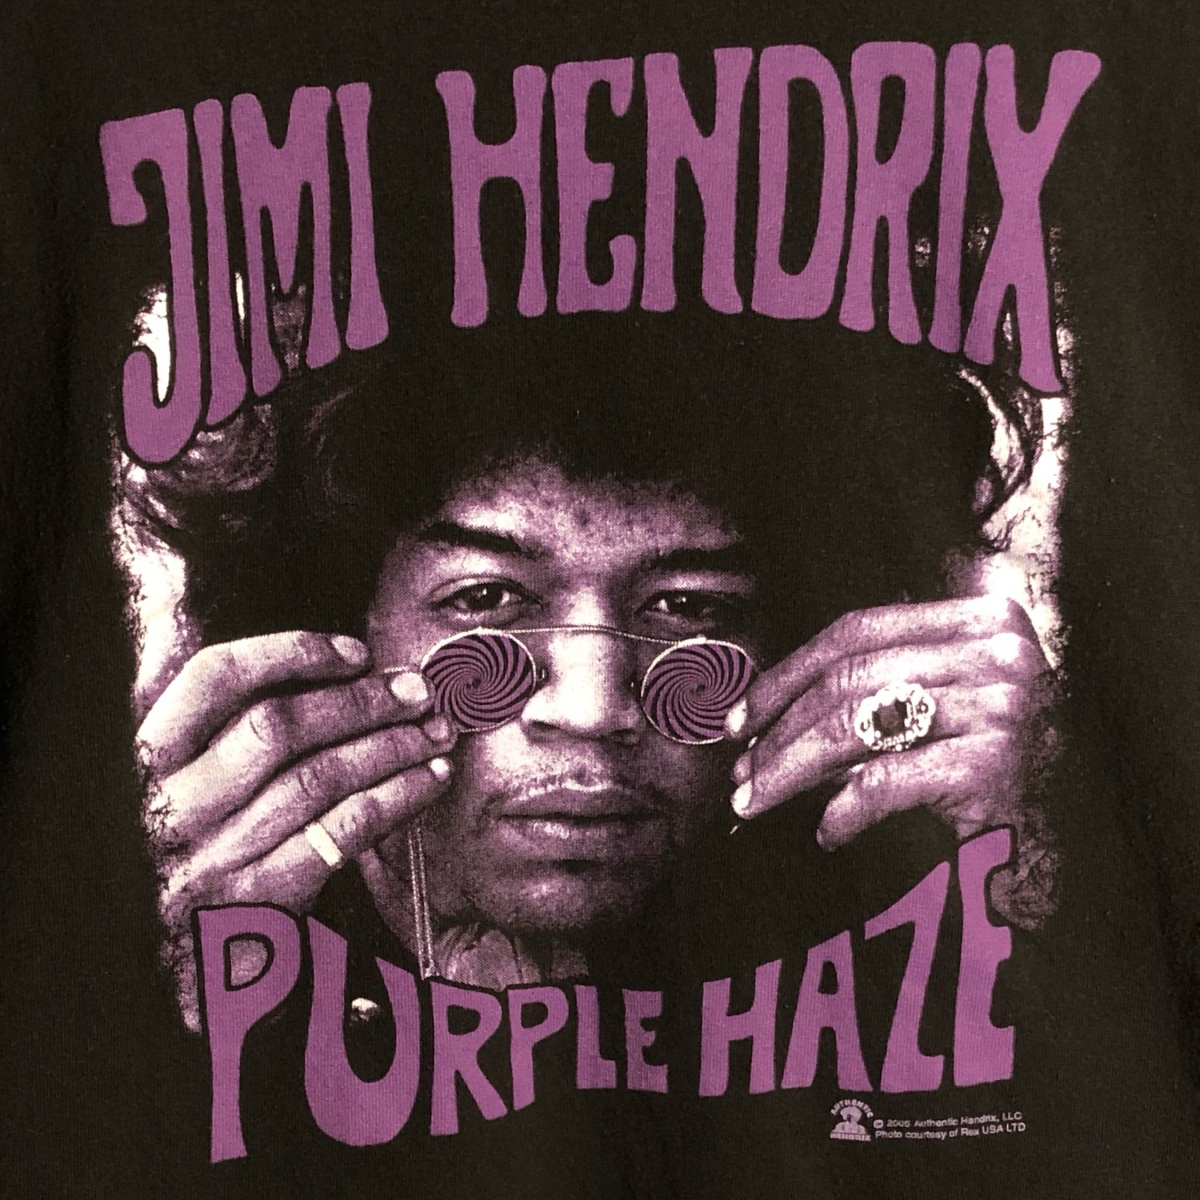 Jimi Hendrix – PurpleHaze